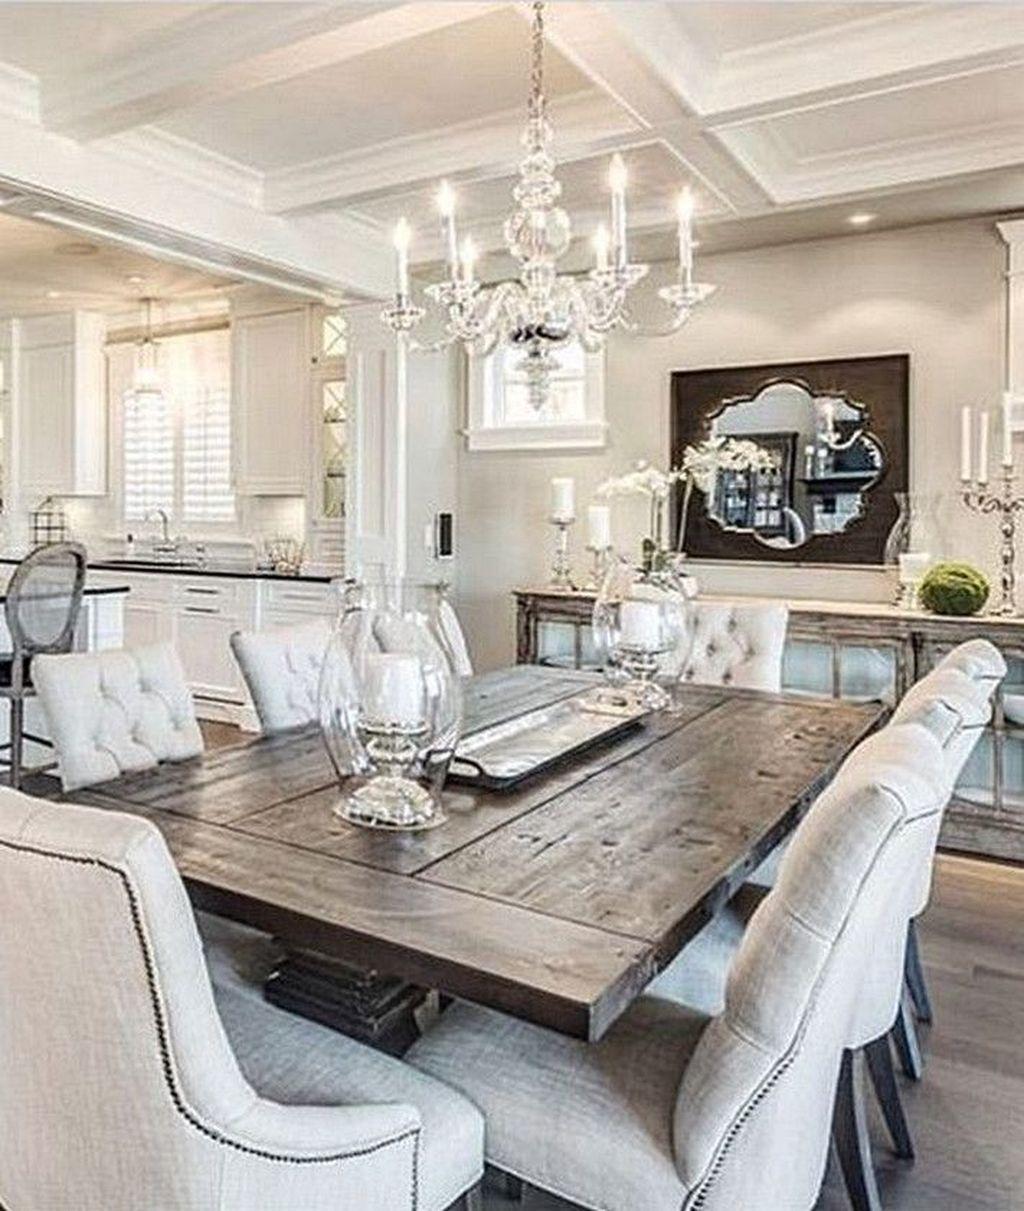 46 Popular Farmhouse Dining Room Design Ideas Trend 2019: 46 Popular Farmhouse Dining Room Design Ideas Trend 2019